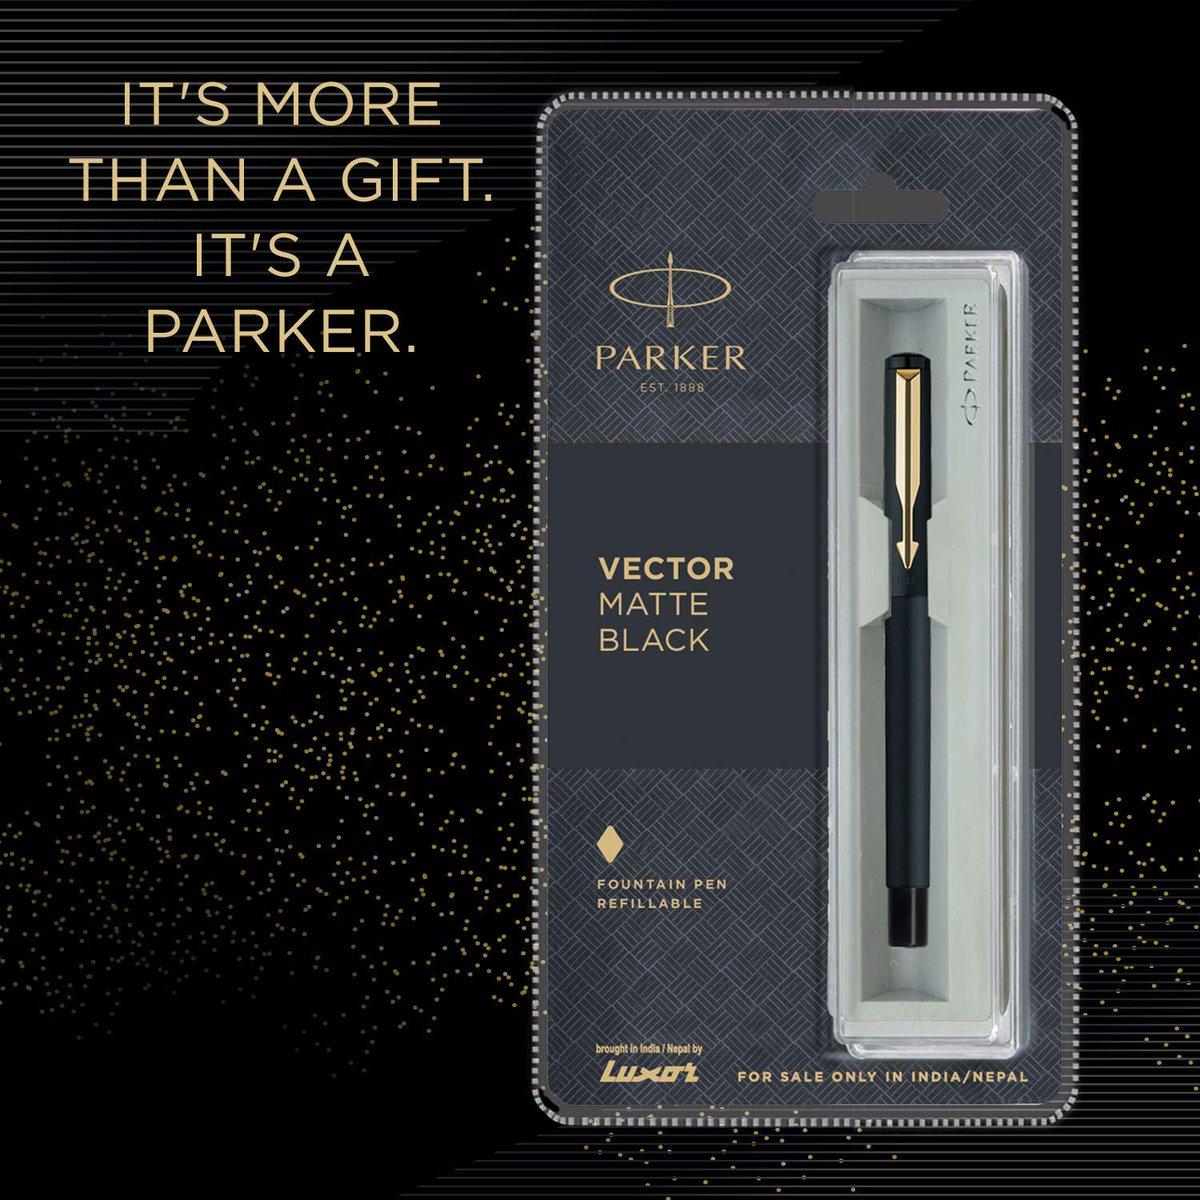 Parker Vector GT Fountain Pen  Check Price - https://amzn.to/2XMdi78  #Parker #Pen #FountainPen #InkPen #Pens #ParkerPen #Gift #Gifts #Amazon #Amazonギフト券 #AmazonDeals #amazondeal #onlineshopping #onlineshop #shoponline #shop #ShopLocal #ShopeeMY #VectorGT #Writer #Fashionpic.twitter.com/eZ7mT3XRge